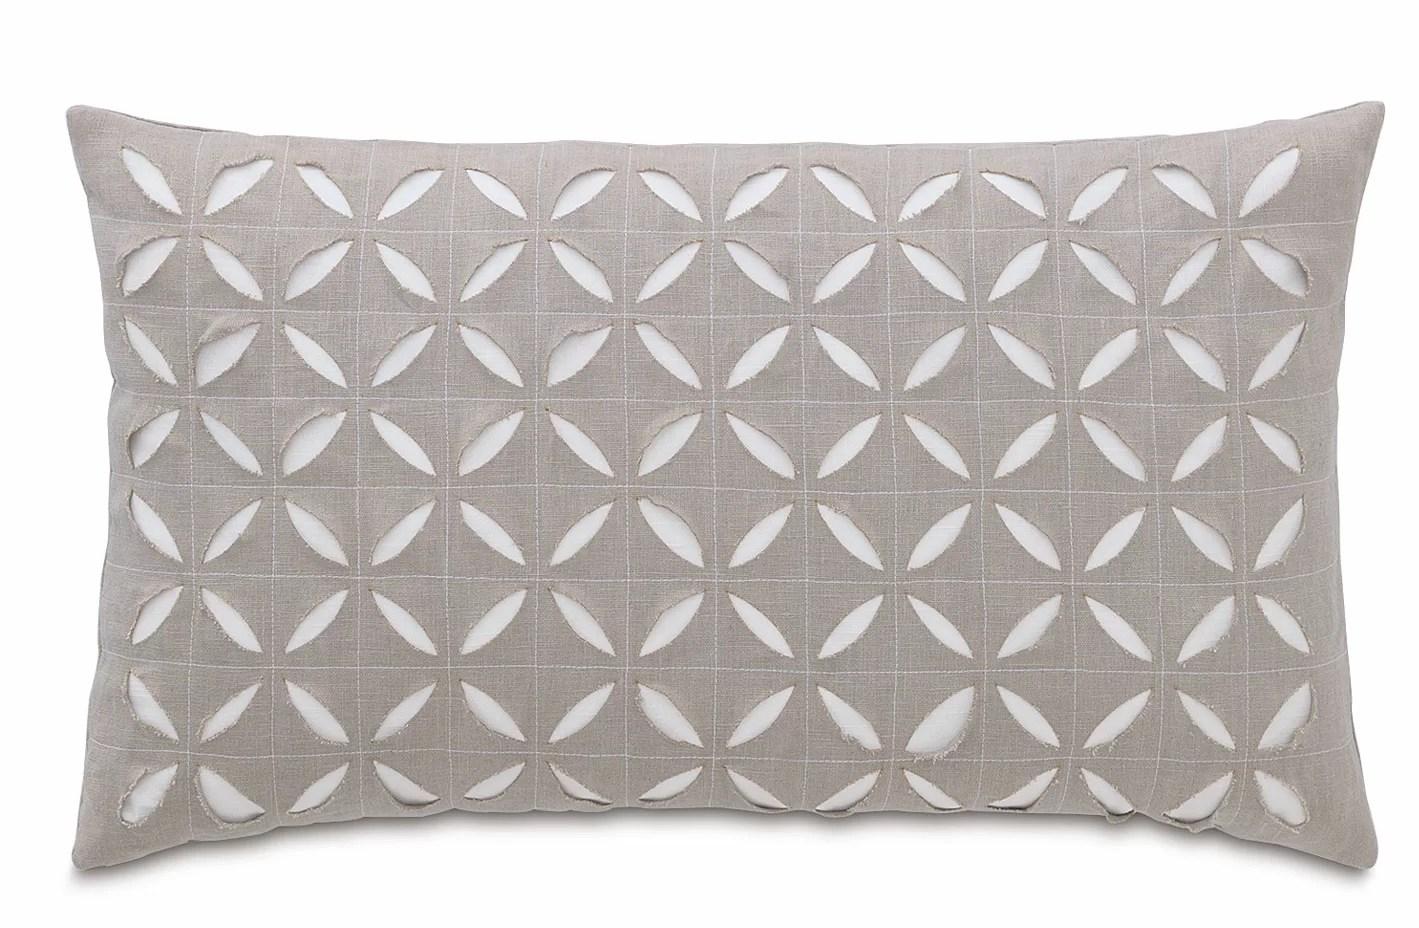 eastern accents amara linen geometric lumbar pillow perigold